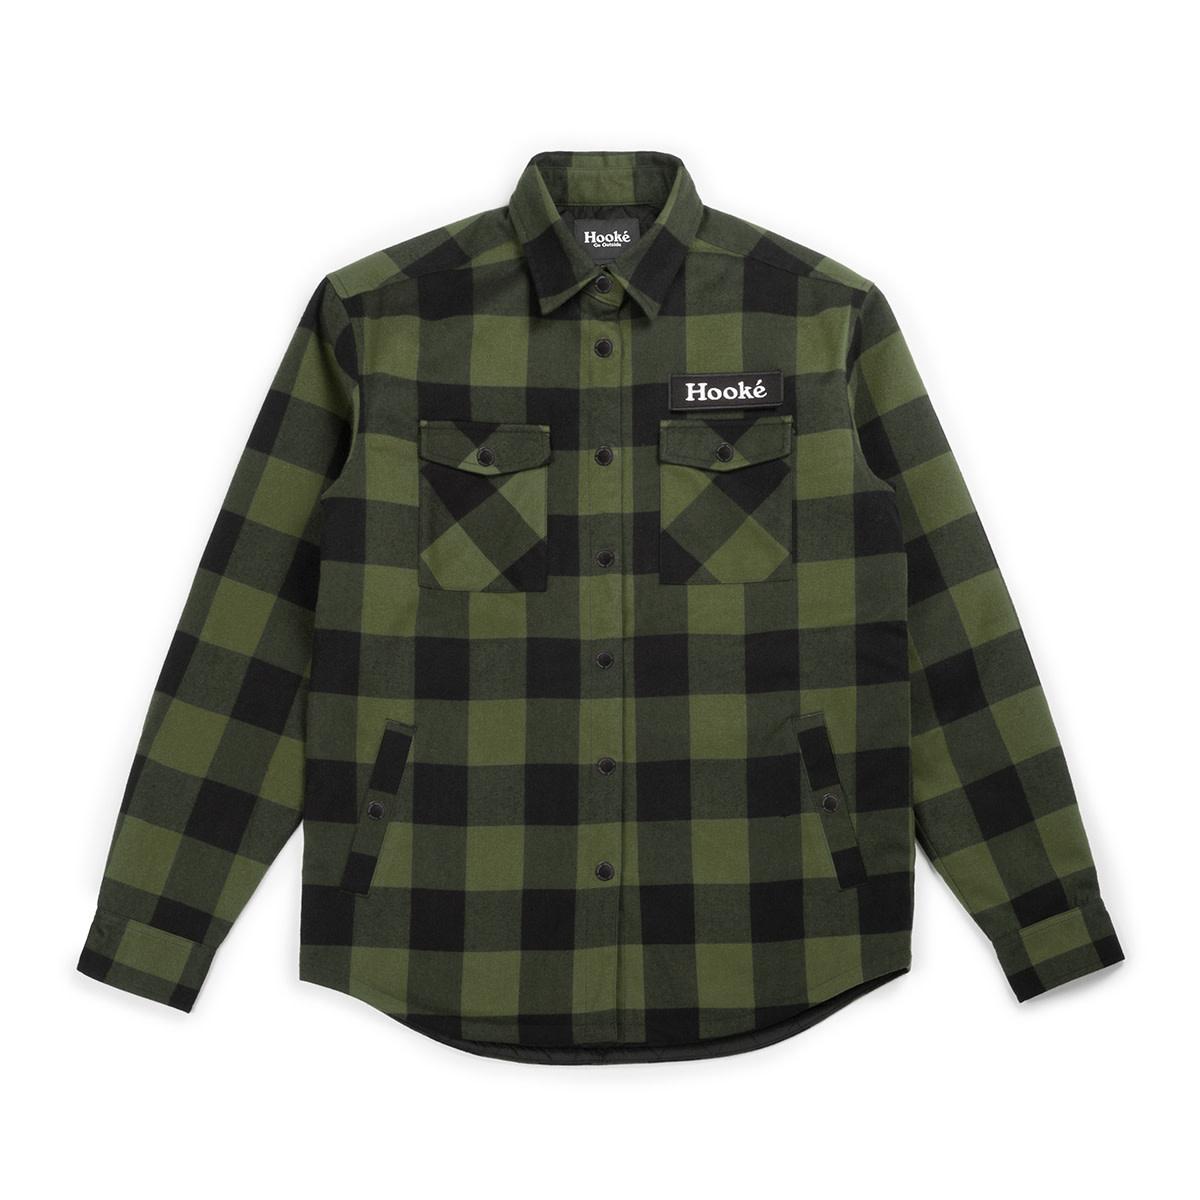 e3f9de4a5 Canadian Shirt Forest Olive & Black